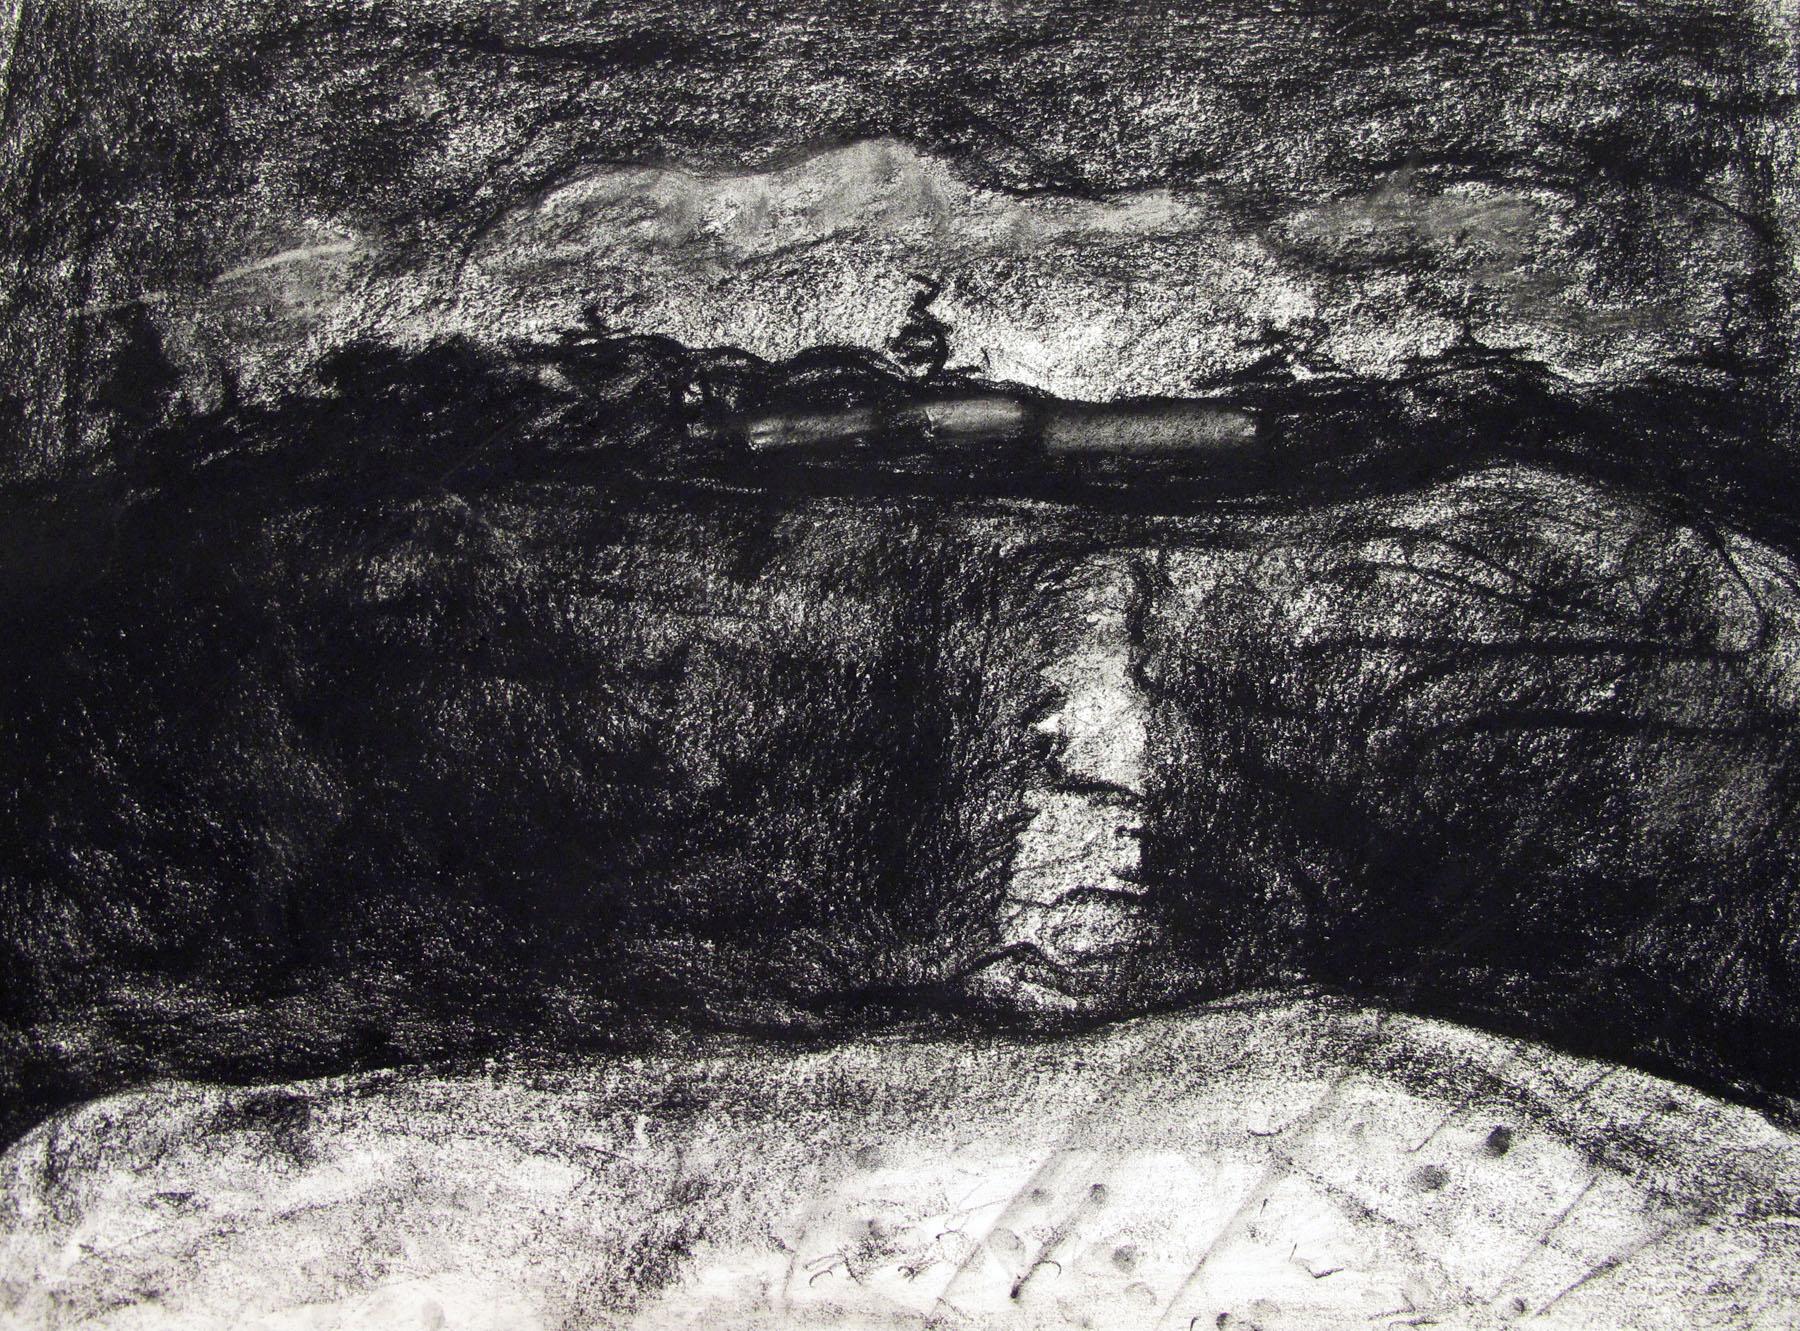 Anne H-nighttime landscape.JPG